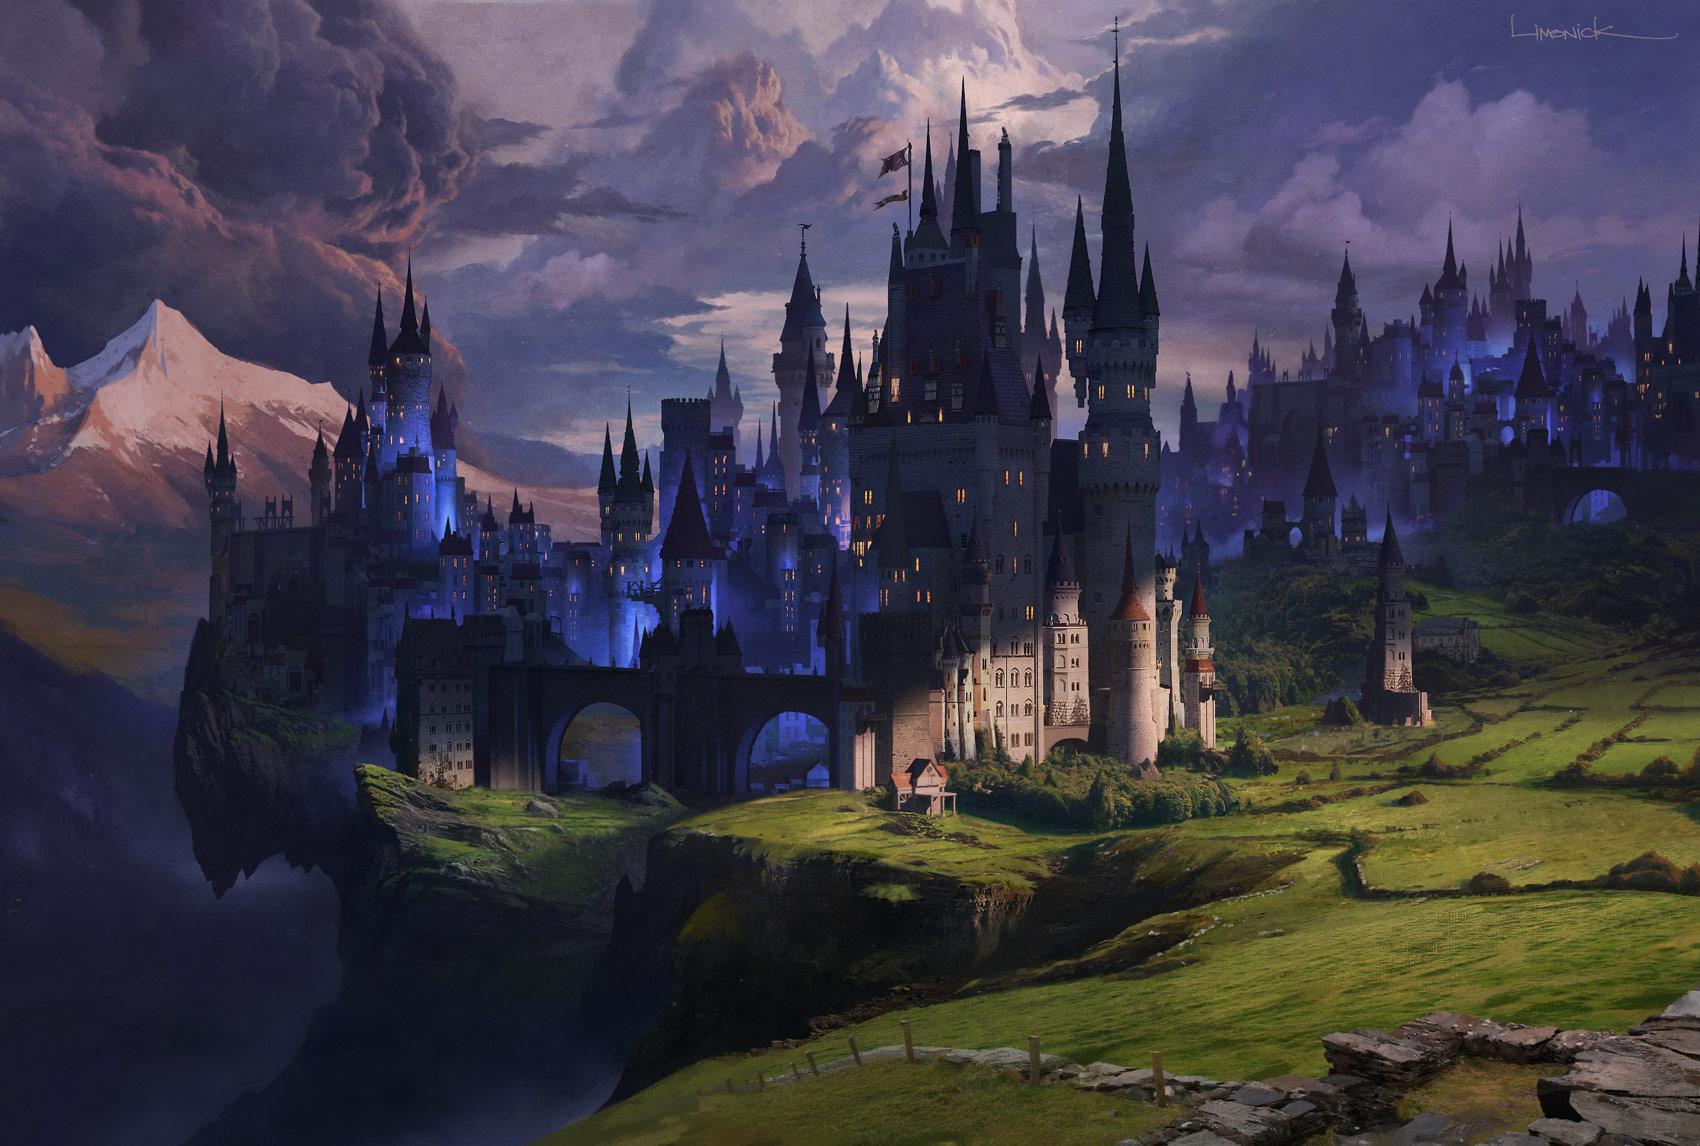 Dark Castle Backgrounds (35 Wallpapers) – Adorable Wallpapers